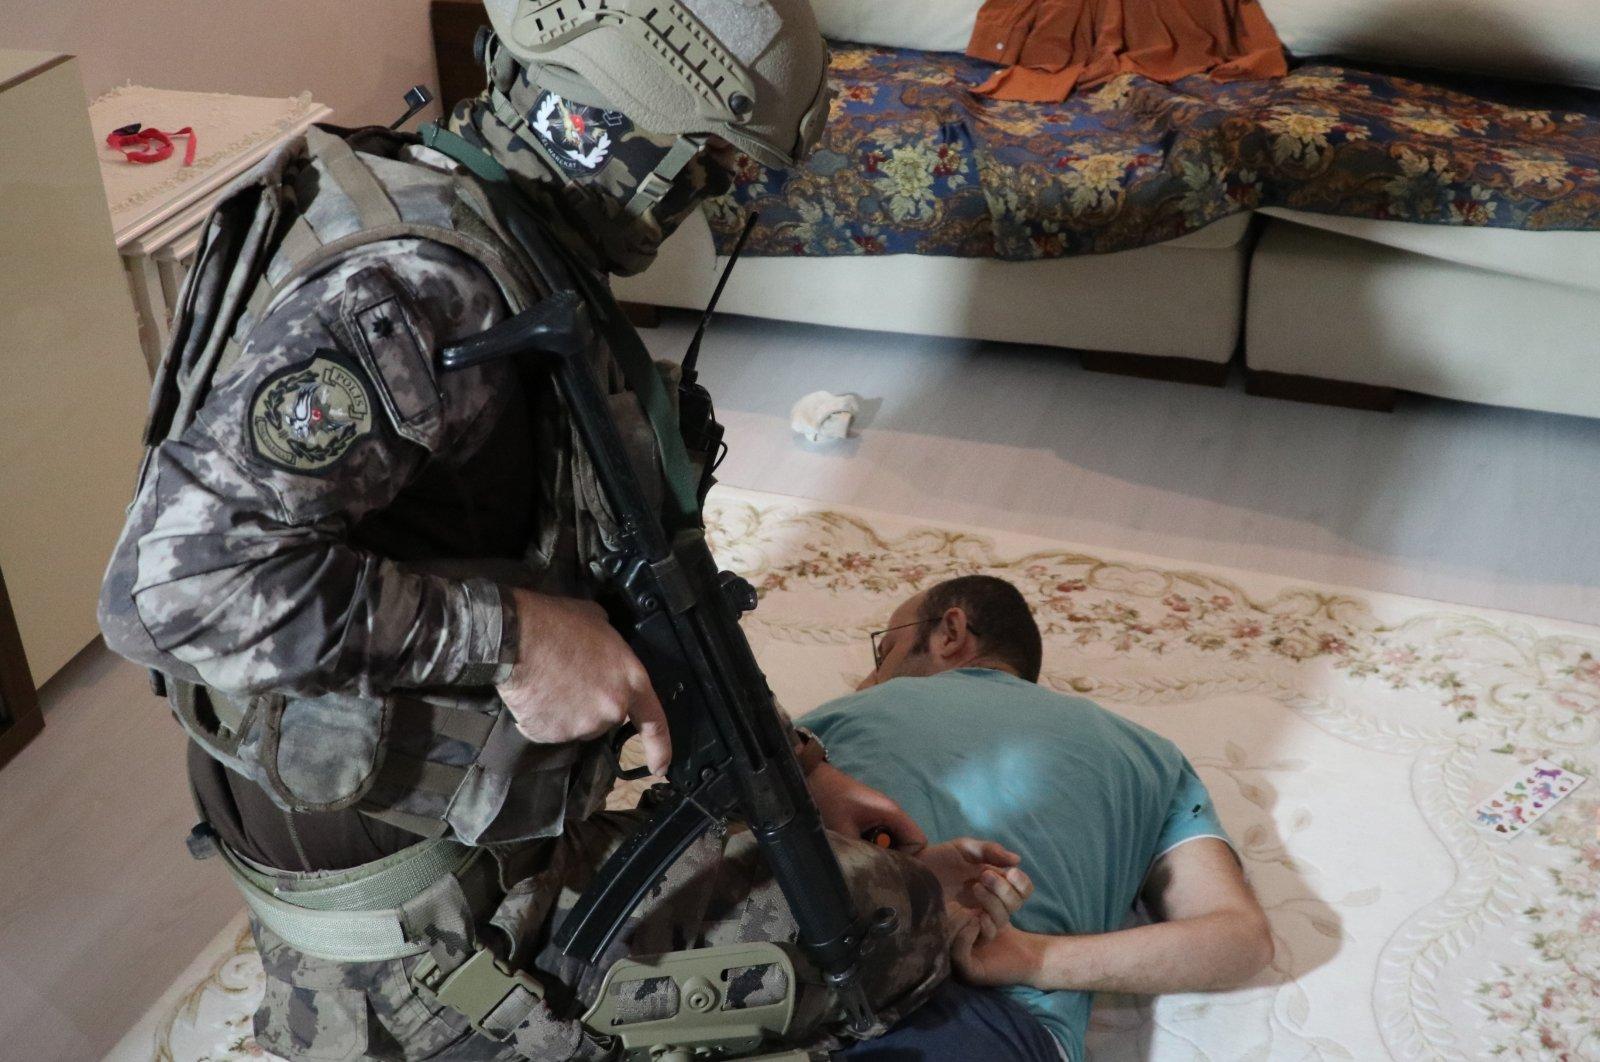 Security forces detain a FETÖ suspect in western Balıkesir province, Turkey, Oct. 27, 2020. (AA Photo)